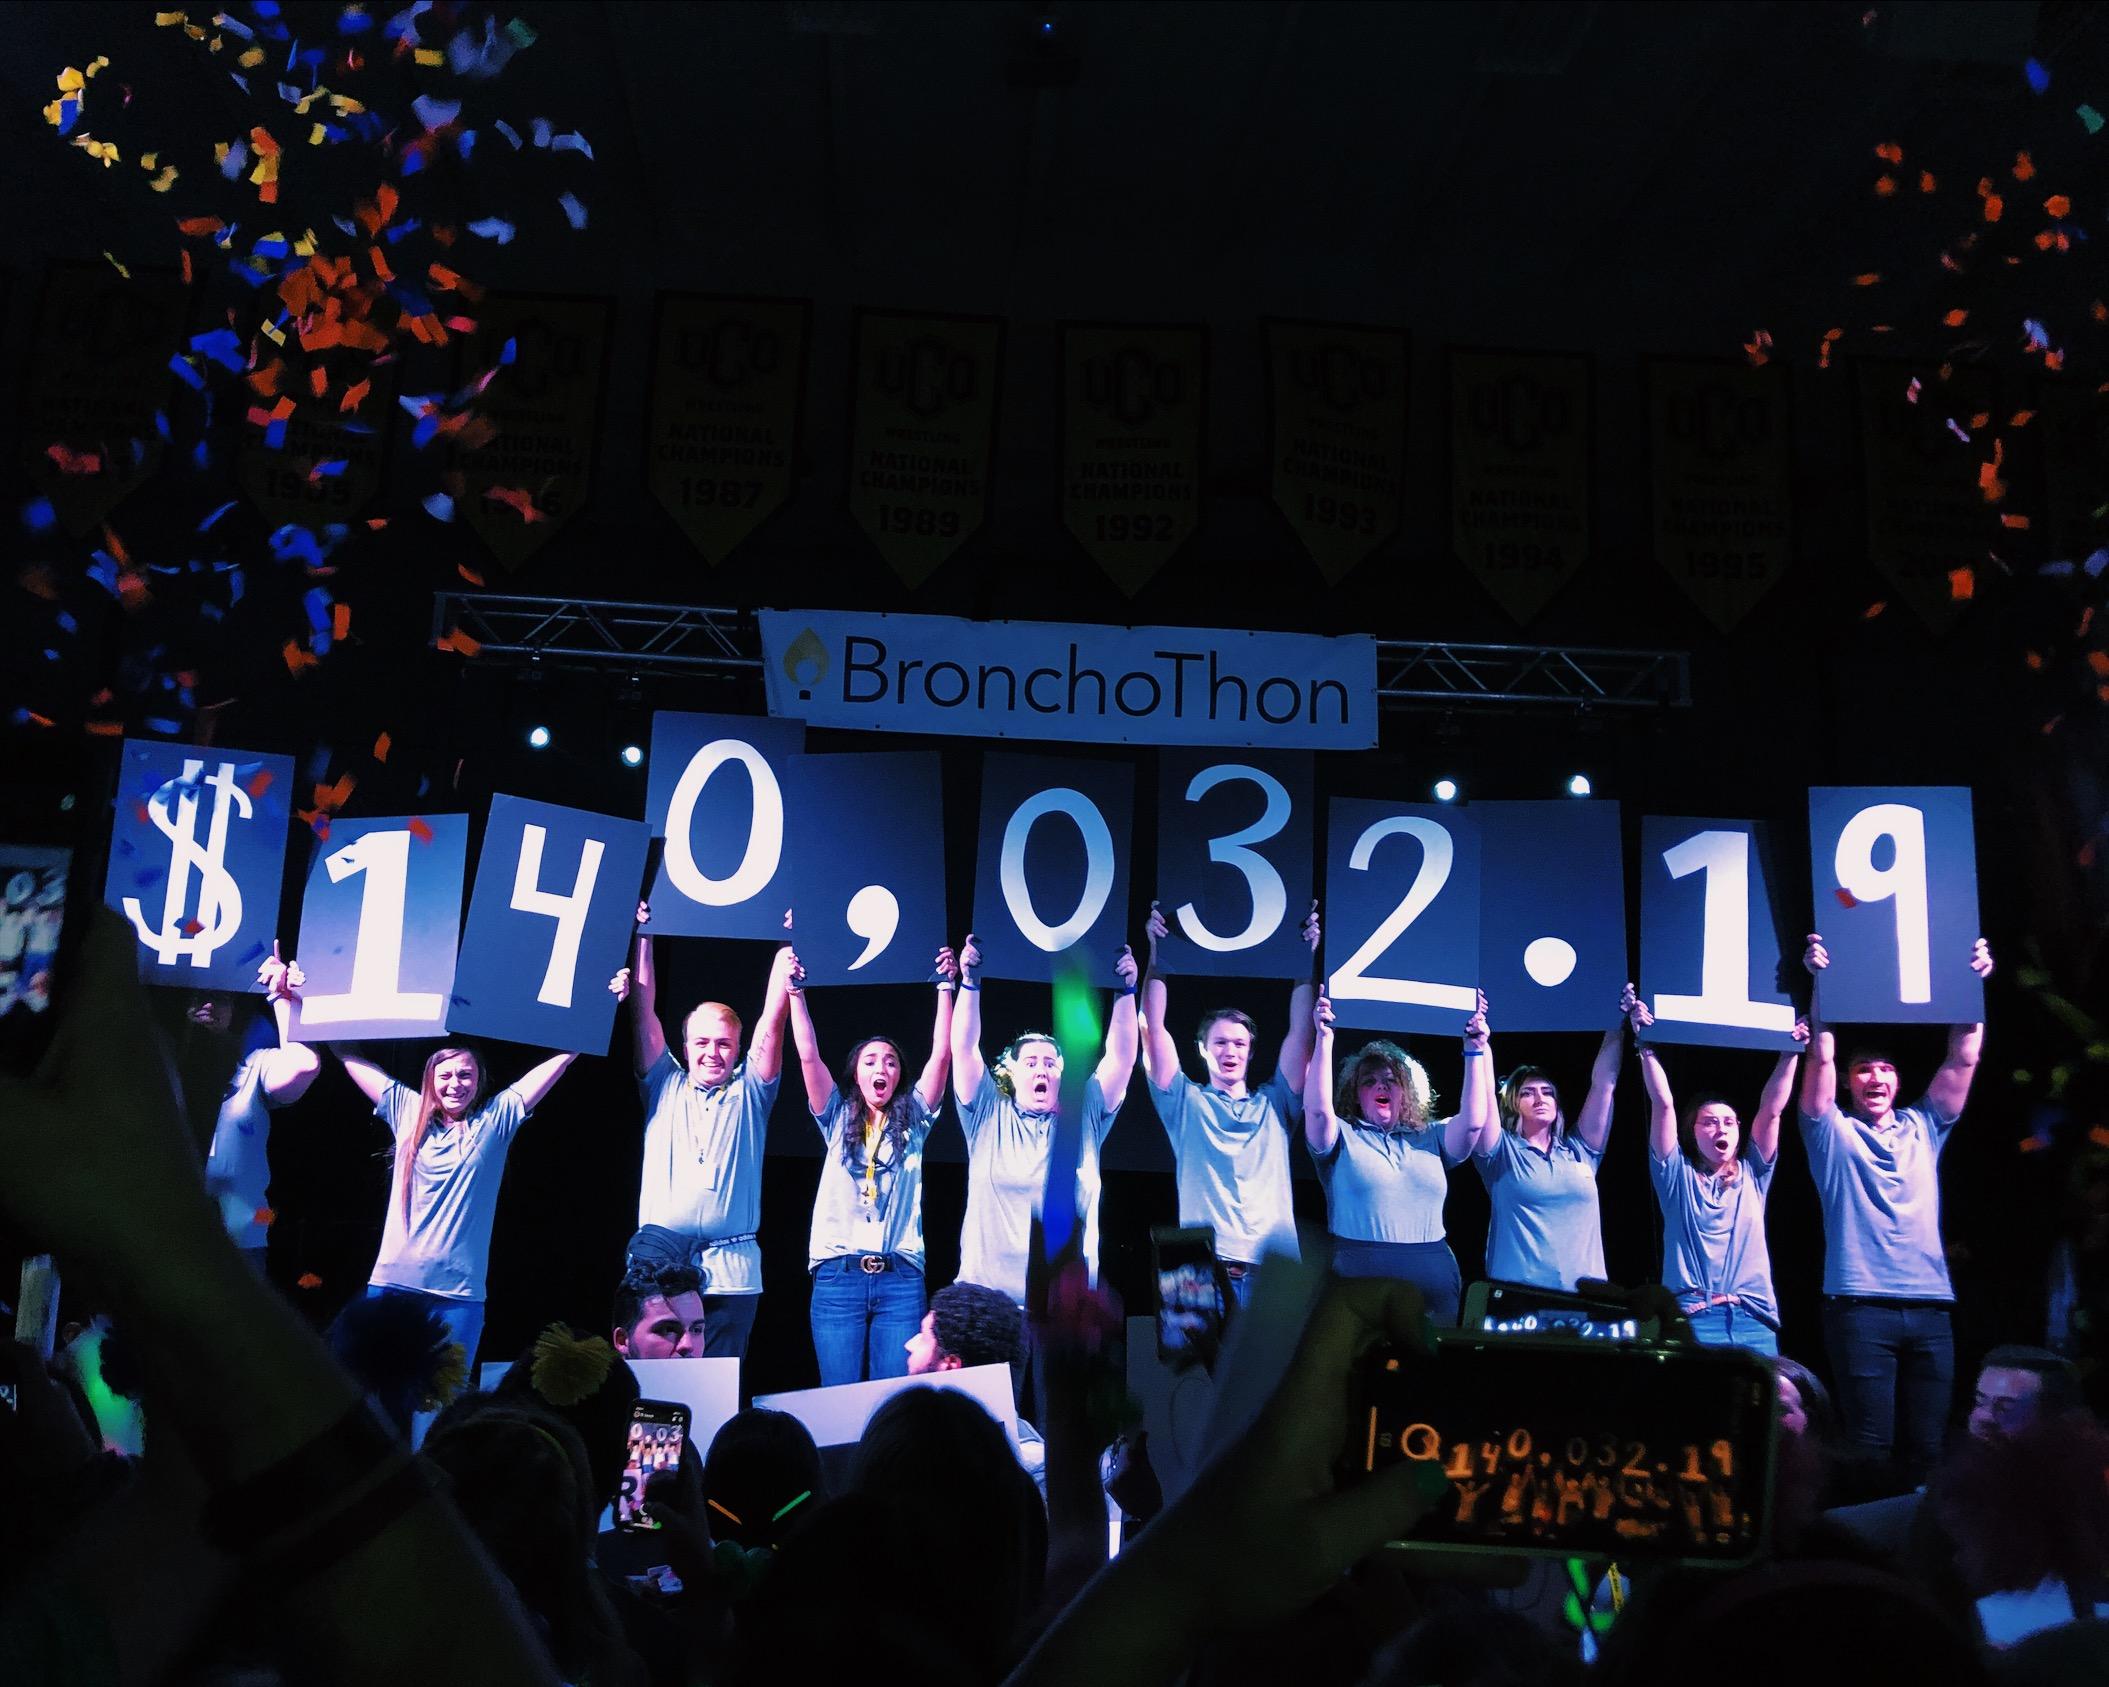 BronchoThon Raises More than $140,000